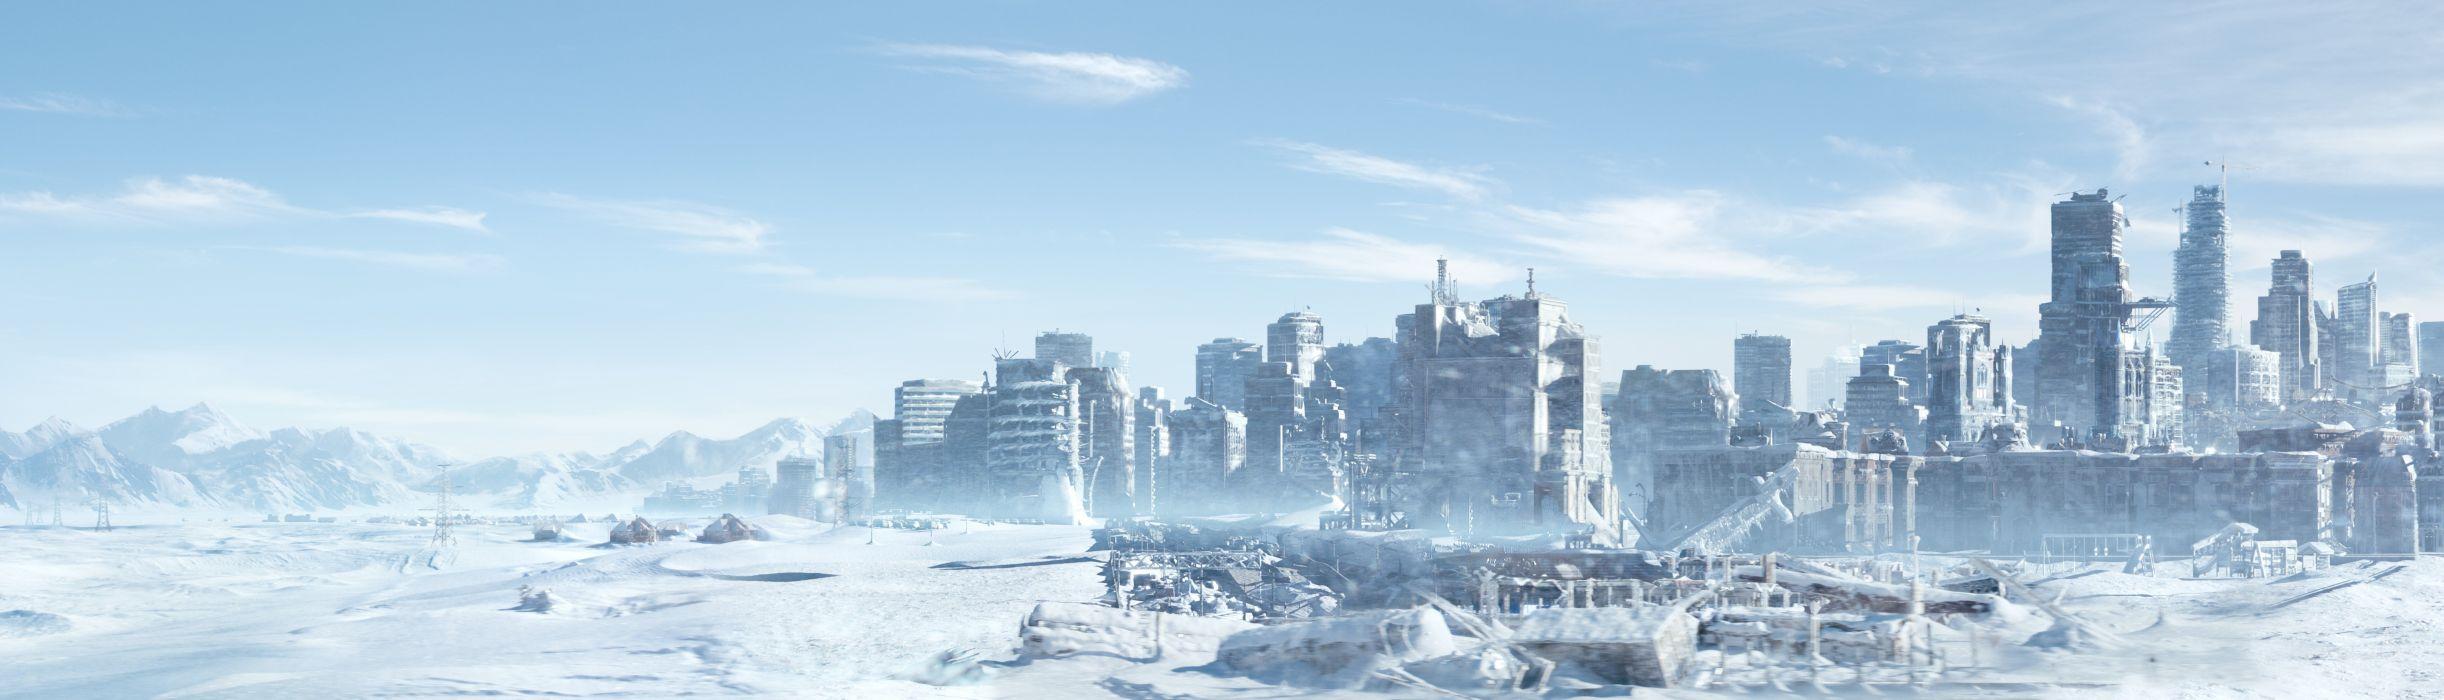 RIDDICK action thriller sci-fi science futuristic warrior chronriddick science fiction diesel chronicles wallpaper